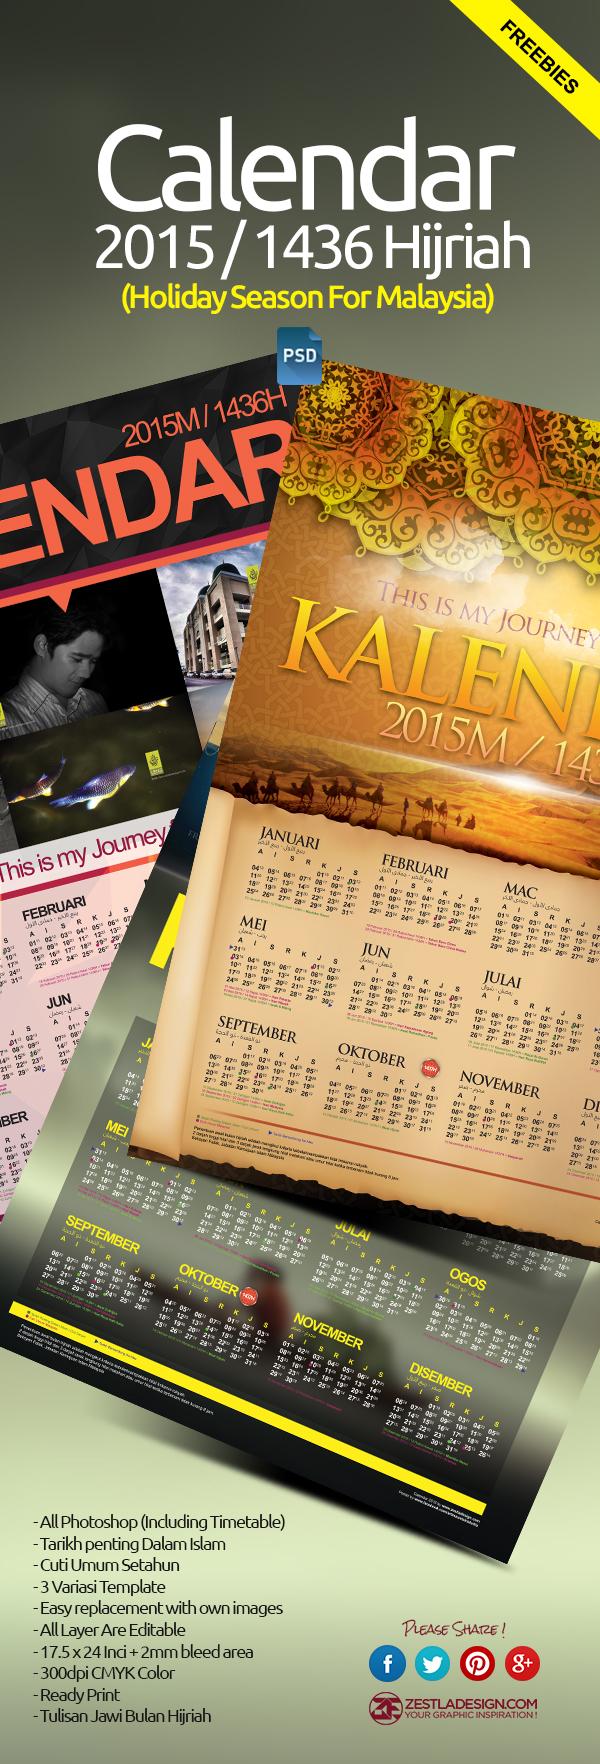 kalendar-2015preview